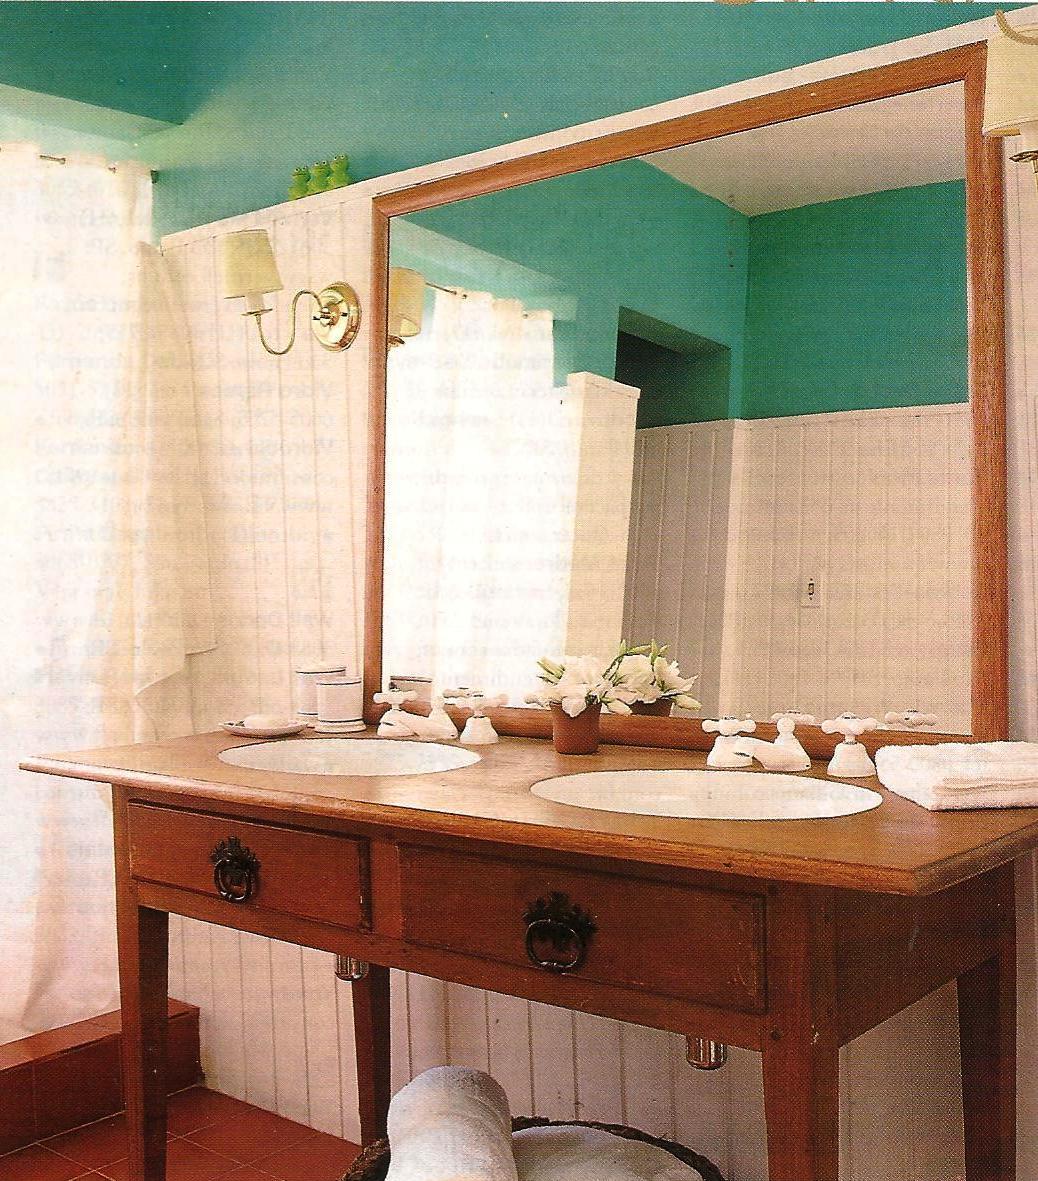 Babuchy Decor: Ainda Sobre Banheiros  #A1642A 1038x1181 Banheiro Antigo